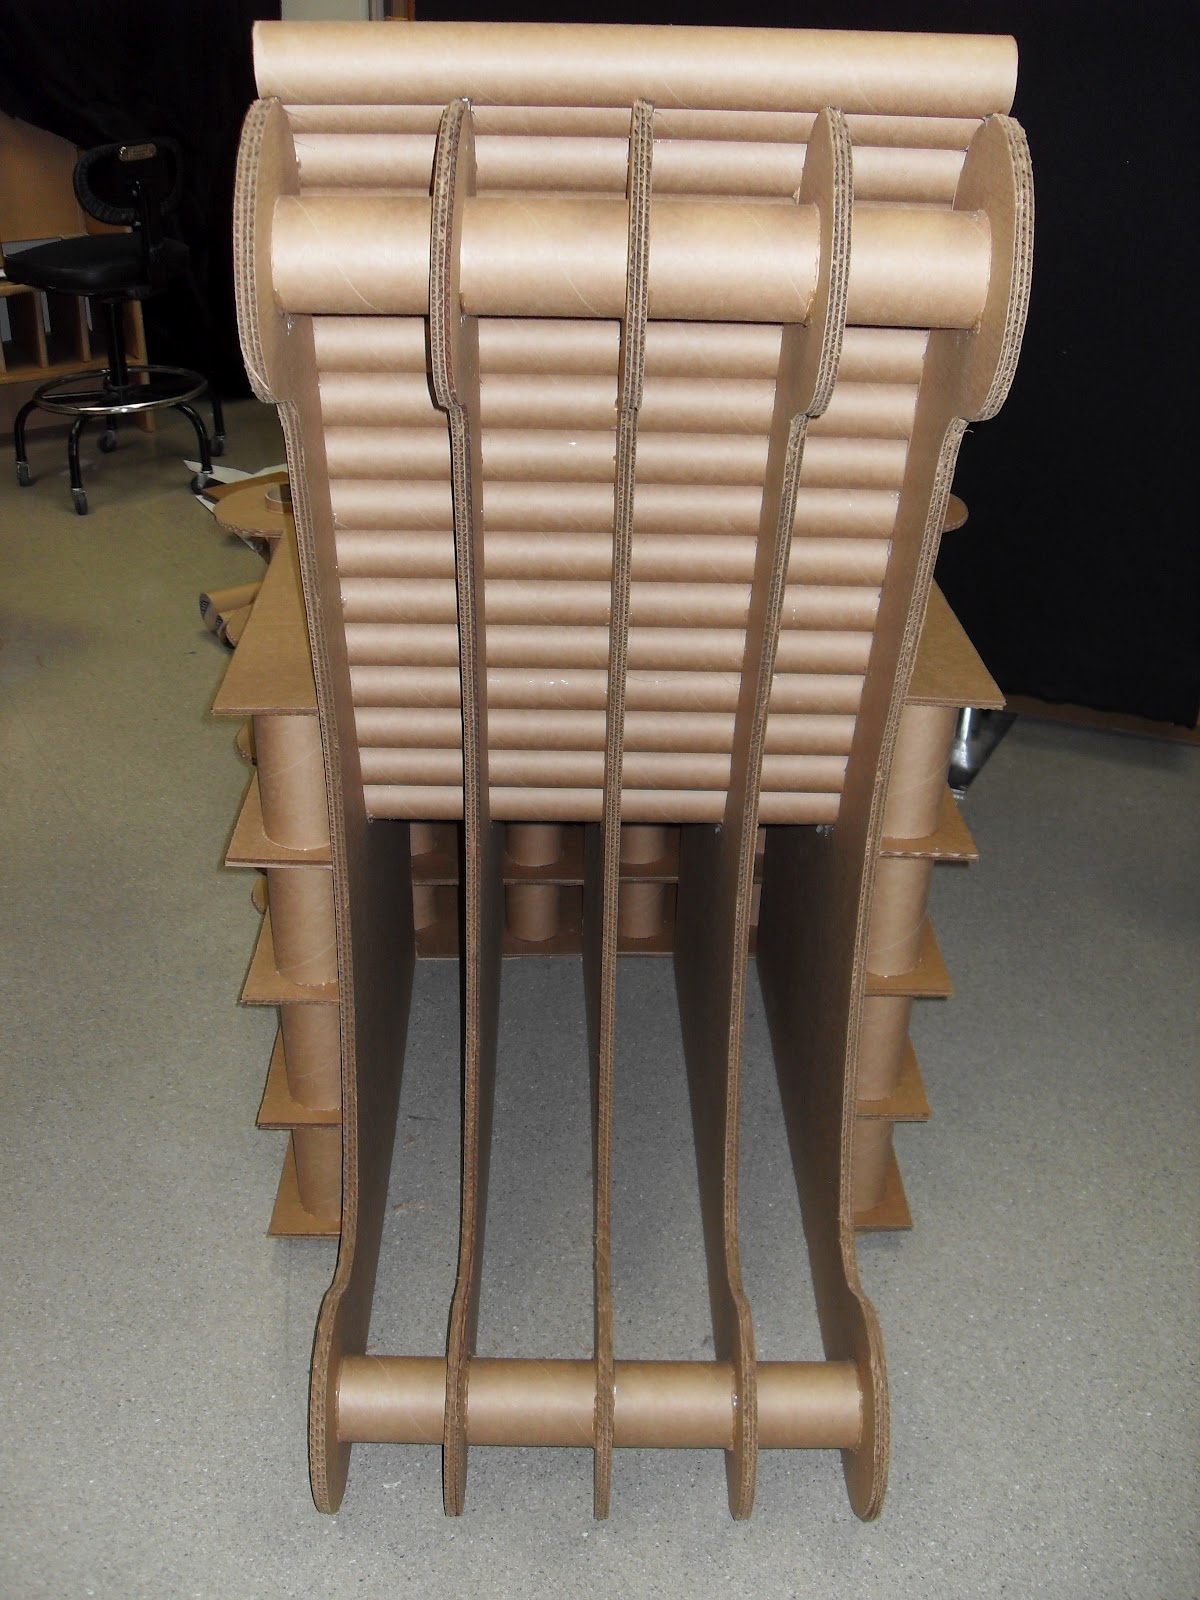 UW Design Gallery 2012 Archive: The Cardboard Throne